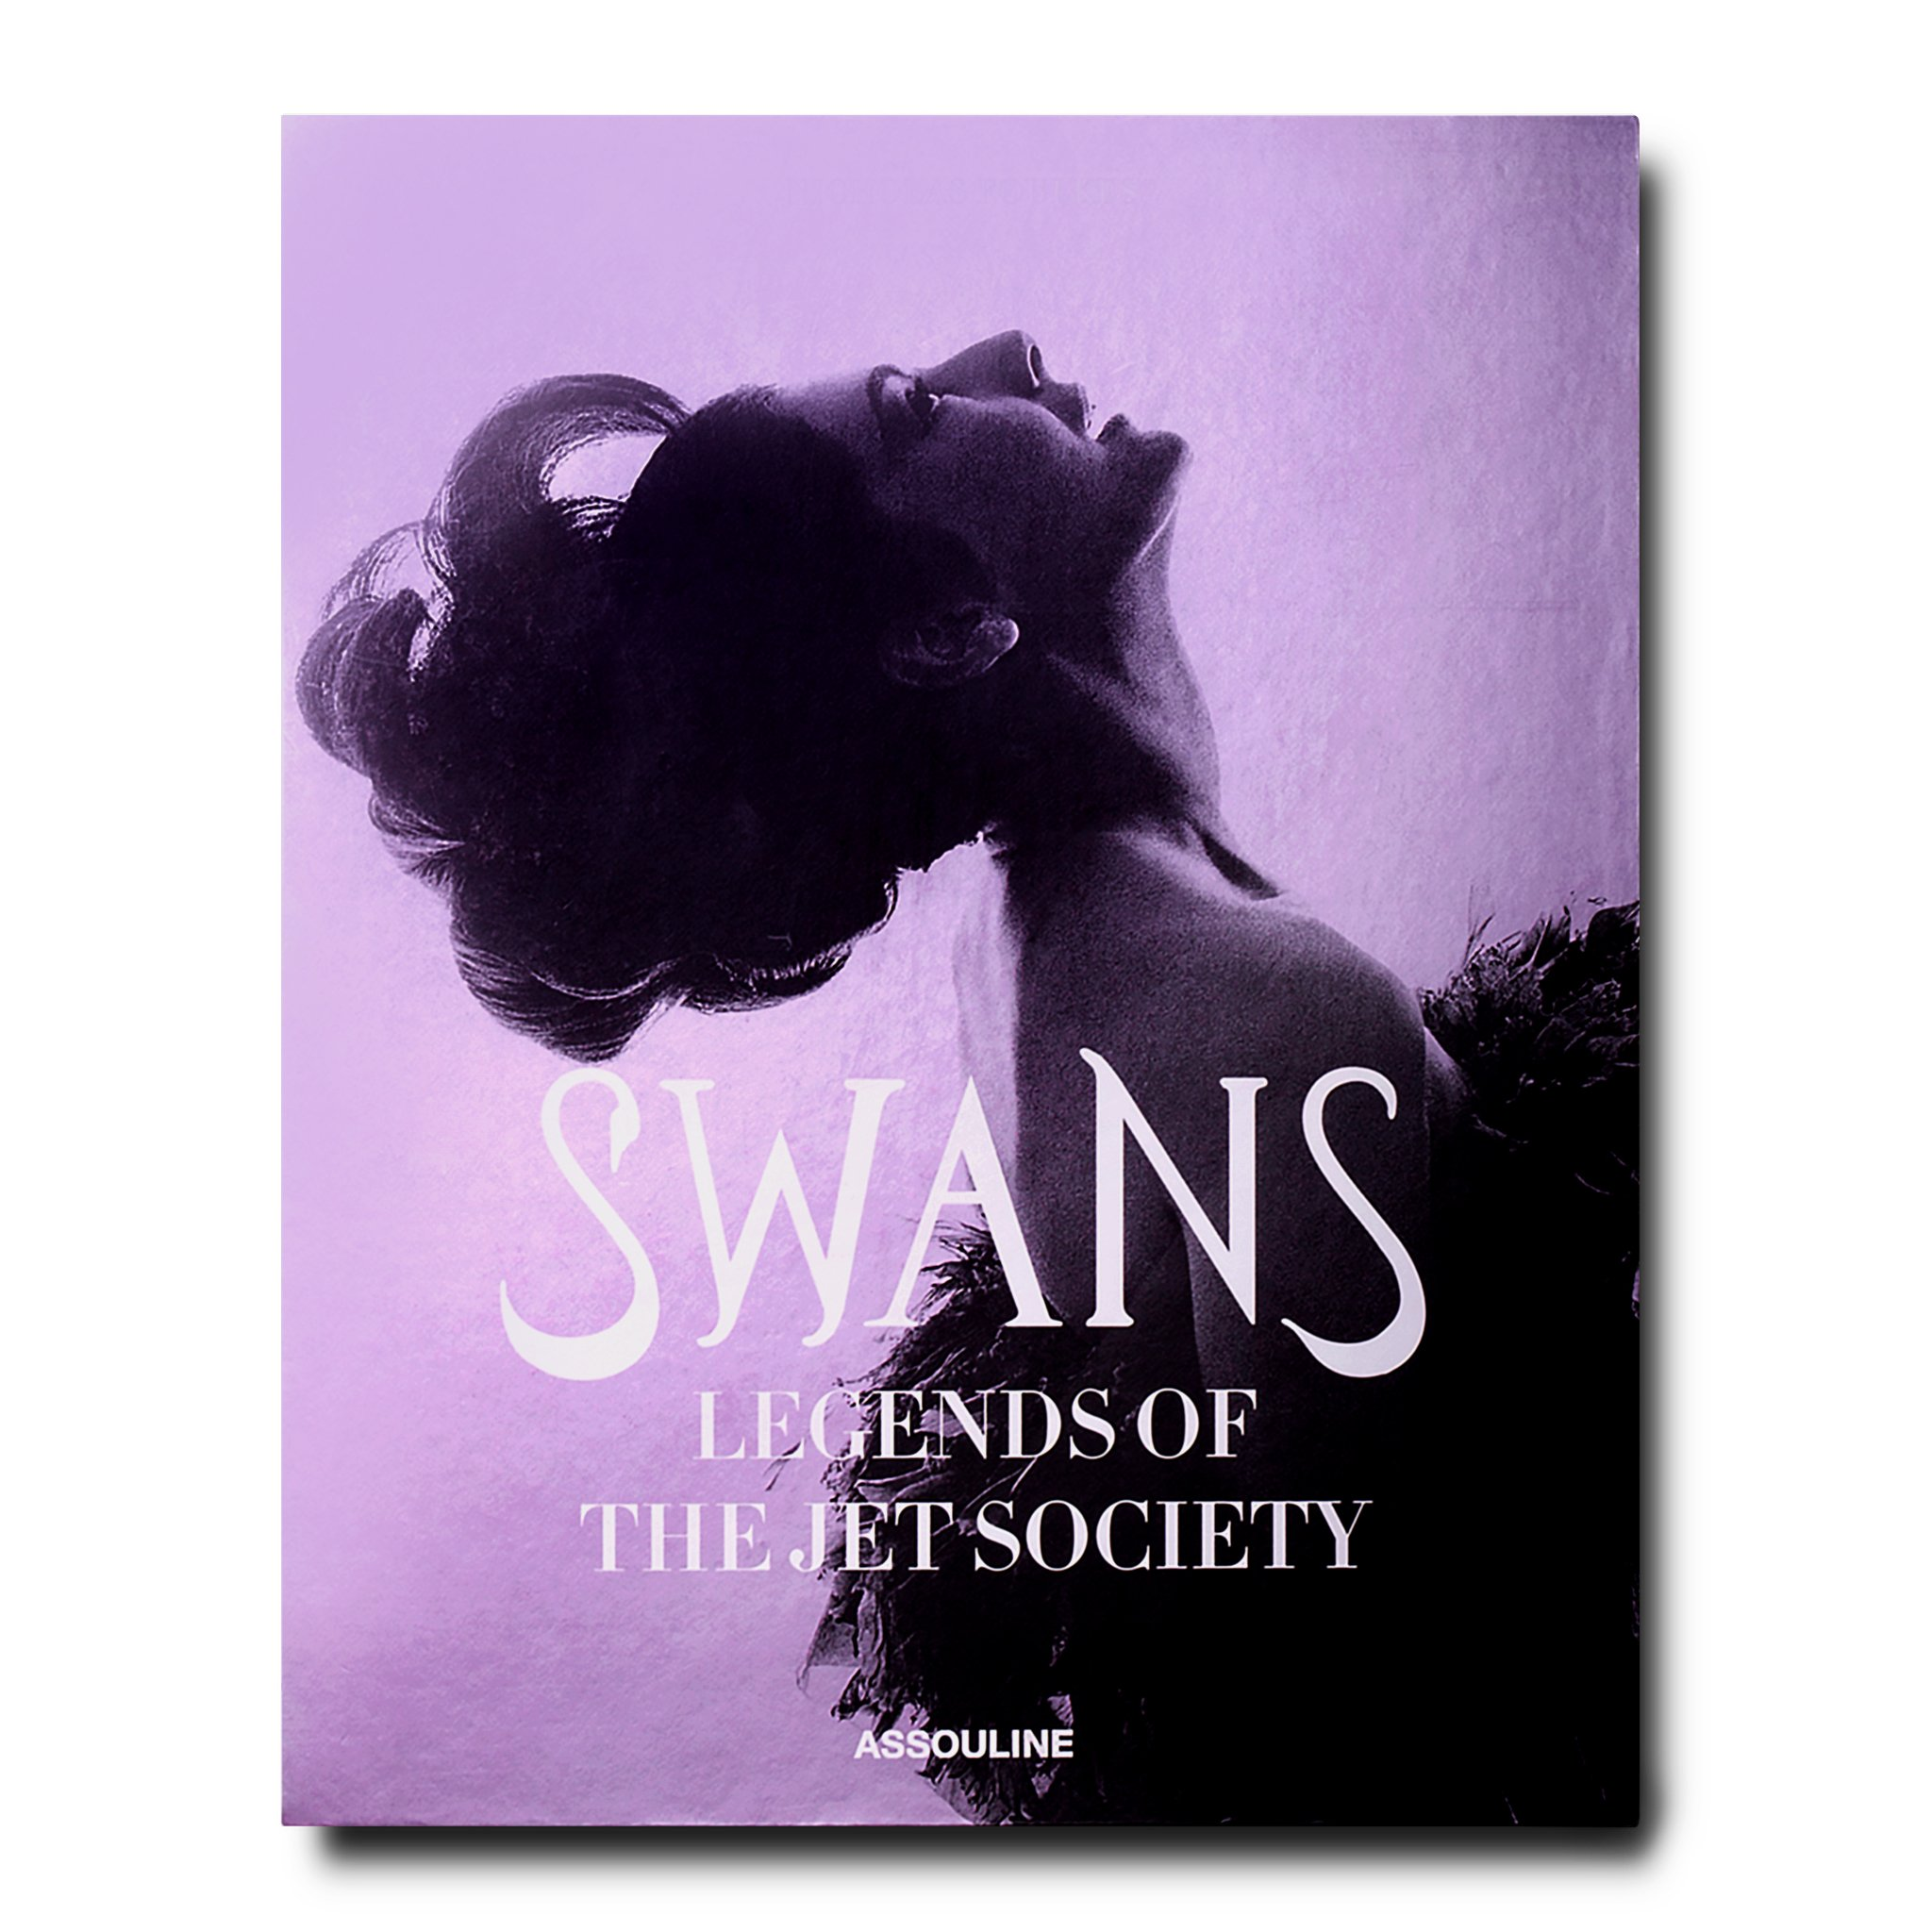 SWANS-A_2048x.jpg